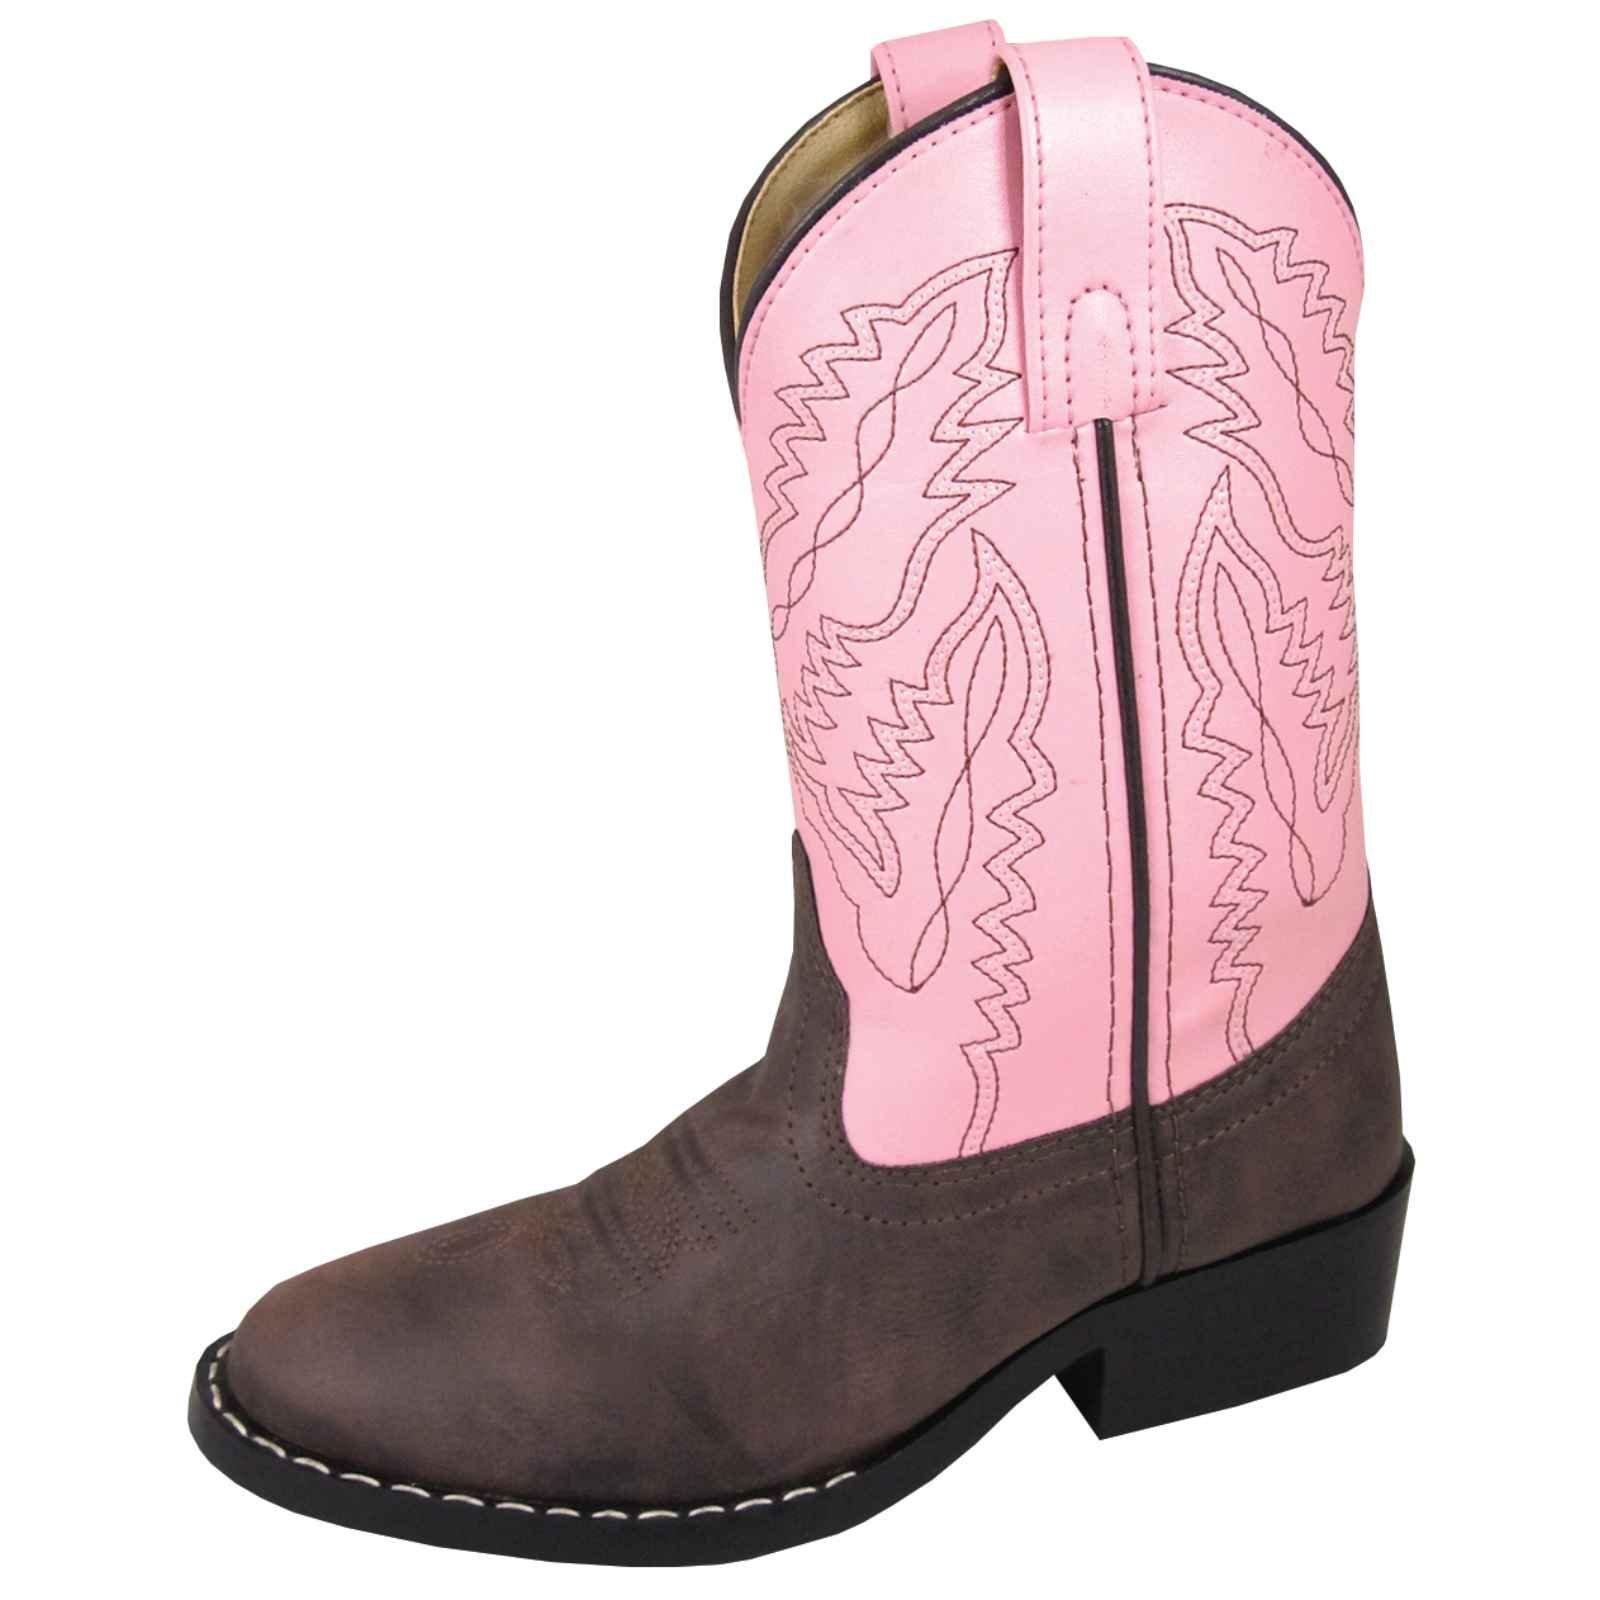 Smoky Mountain Childrens Girls Monterey Boots Brown/Pink, 1M